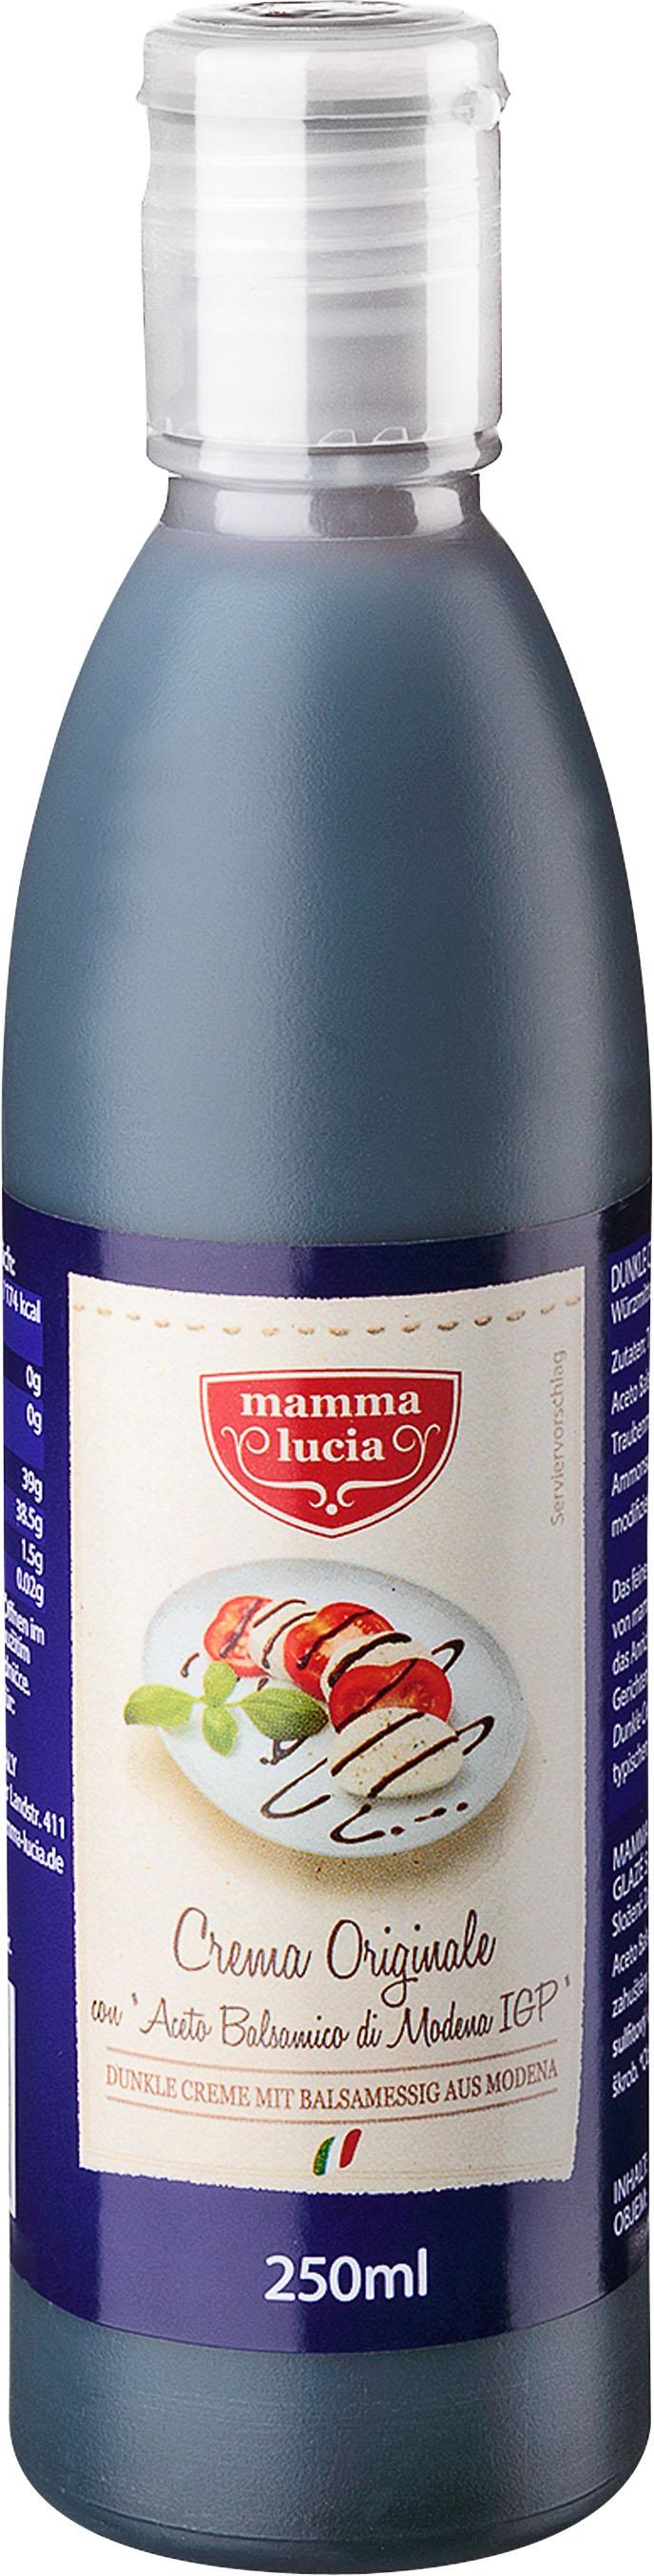 Abbildung des Angebots Mamma Lucia Crema Aceto Balsamico